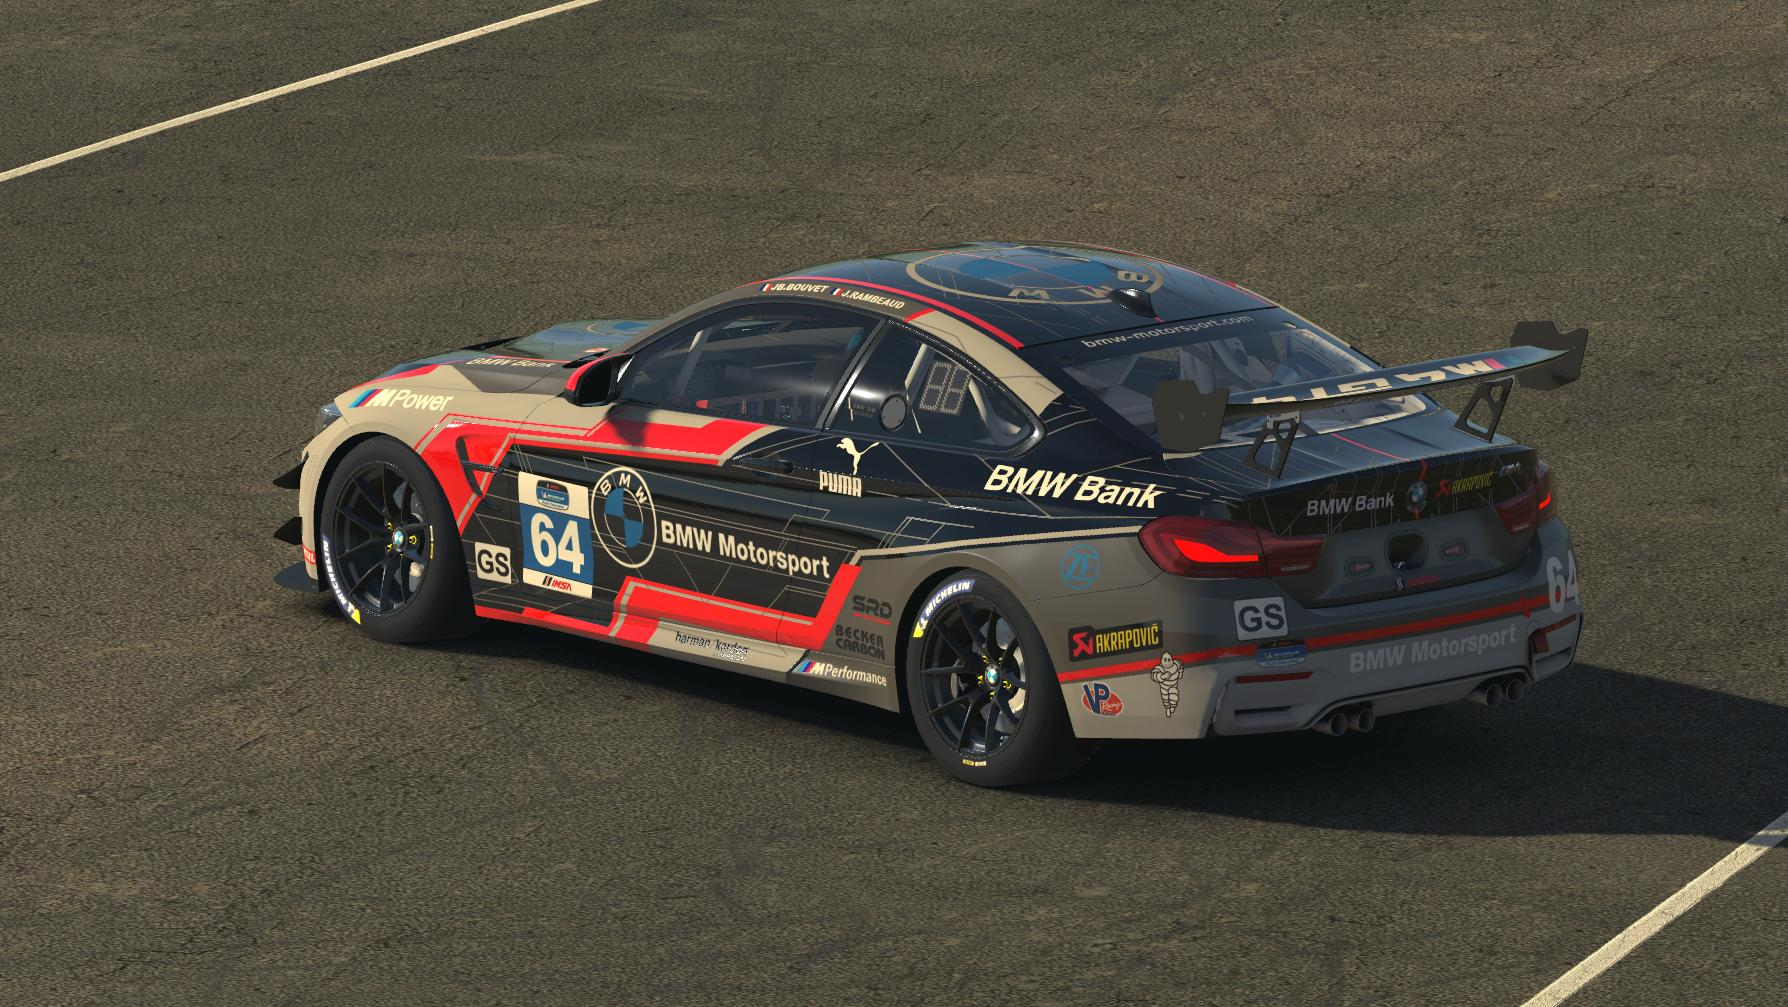 Preview of BMW M4 GT4 BMW Motorsport by Julien R.